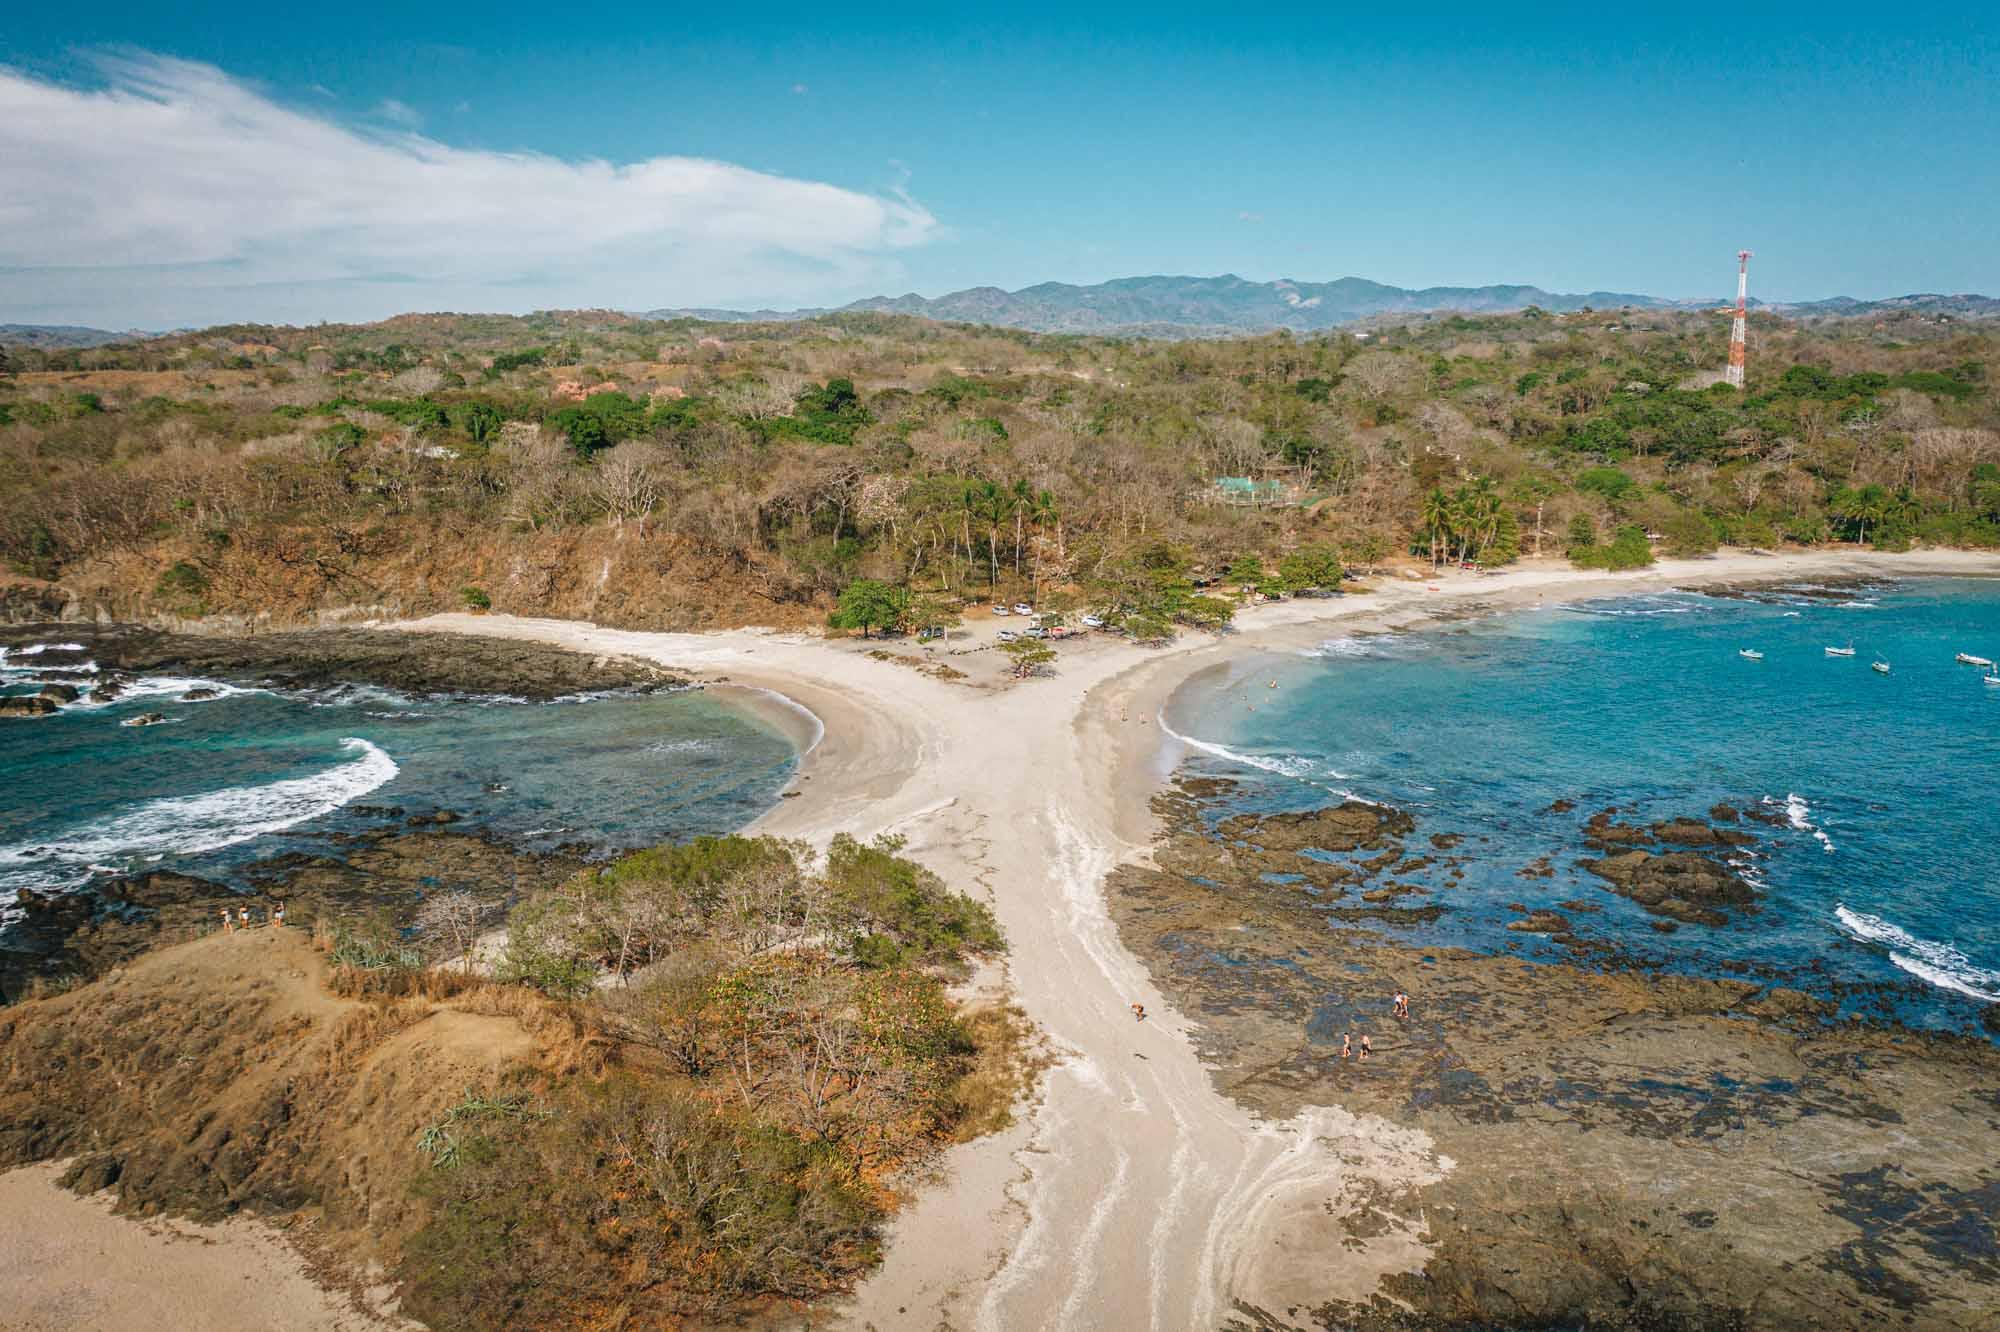 San Juanillo beach, Guanacaste, Costa Rica